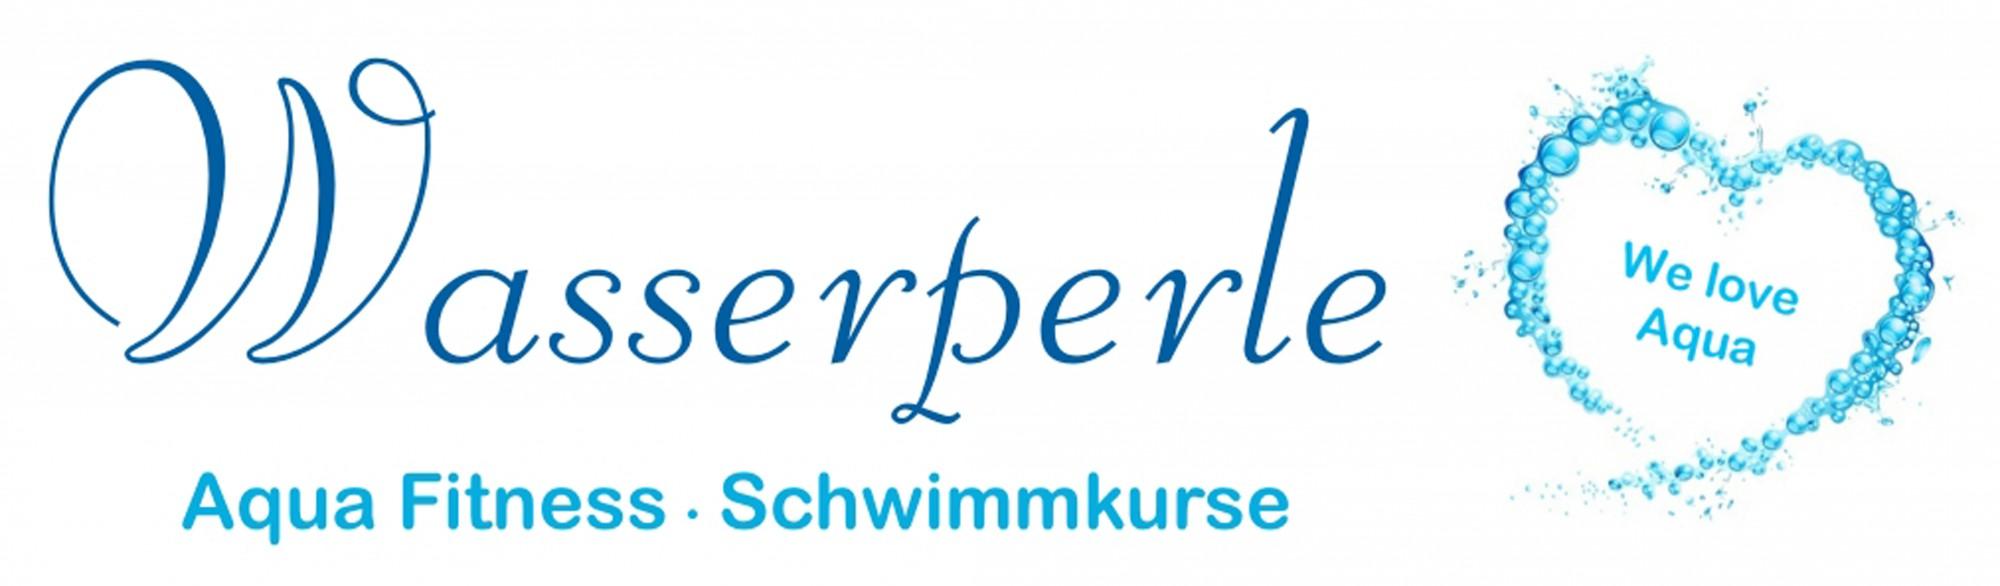 wasserperle.info – Aqua Fitness + Schwimmkurse in Nürnberg + Umgebung